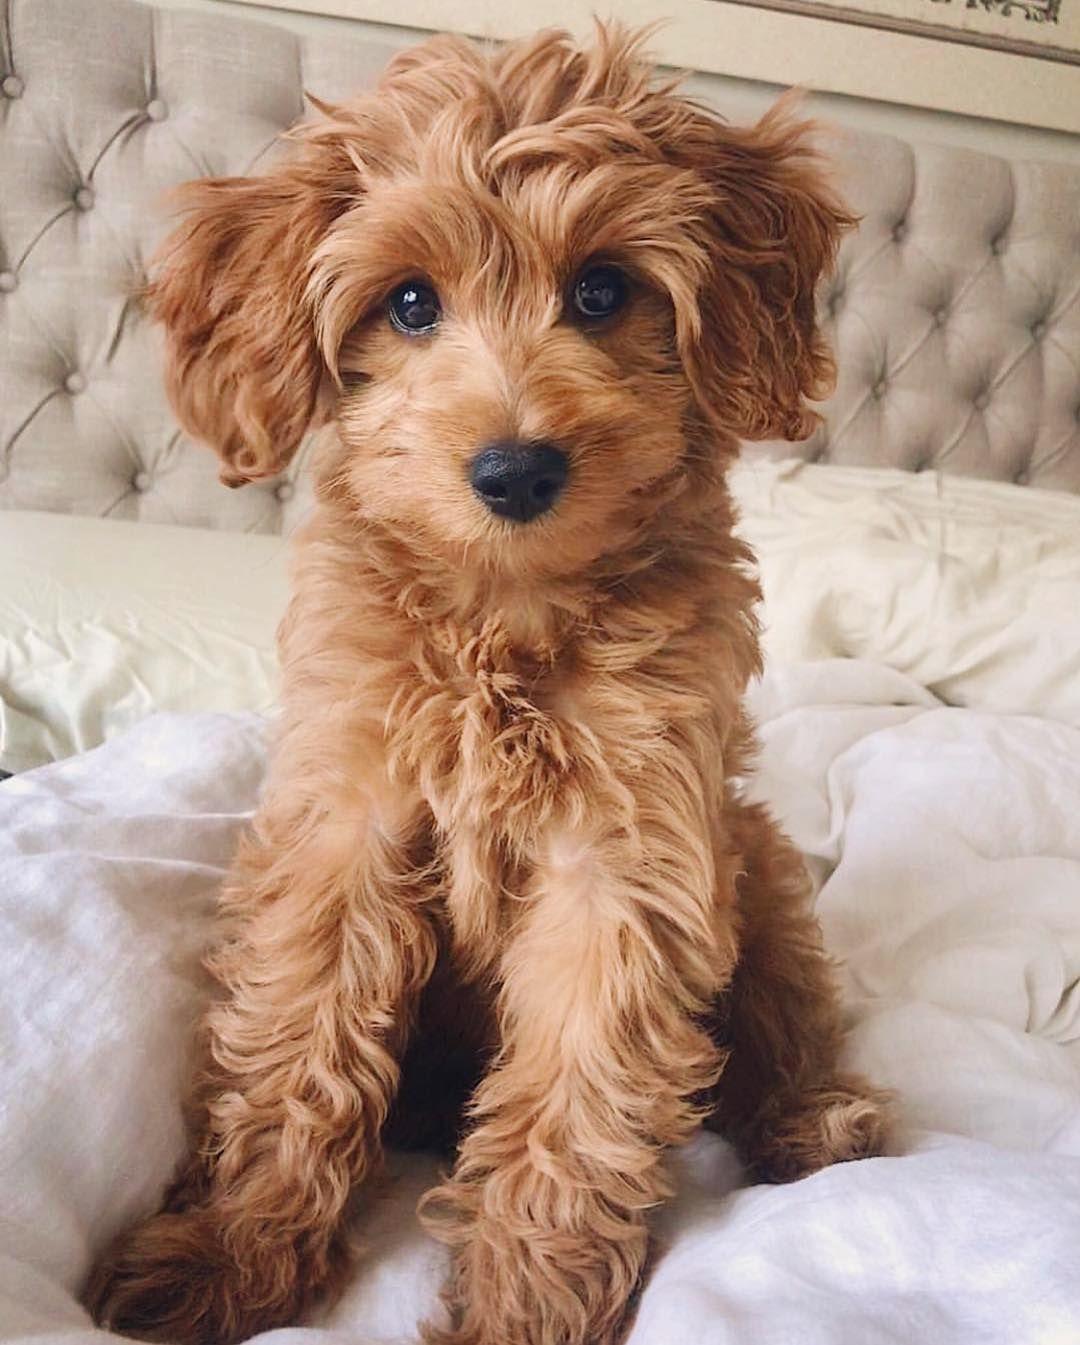 Irish Doodle The Poodle Irish Setter Mix Puppies Cute Dogs